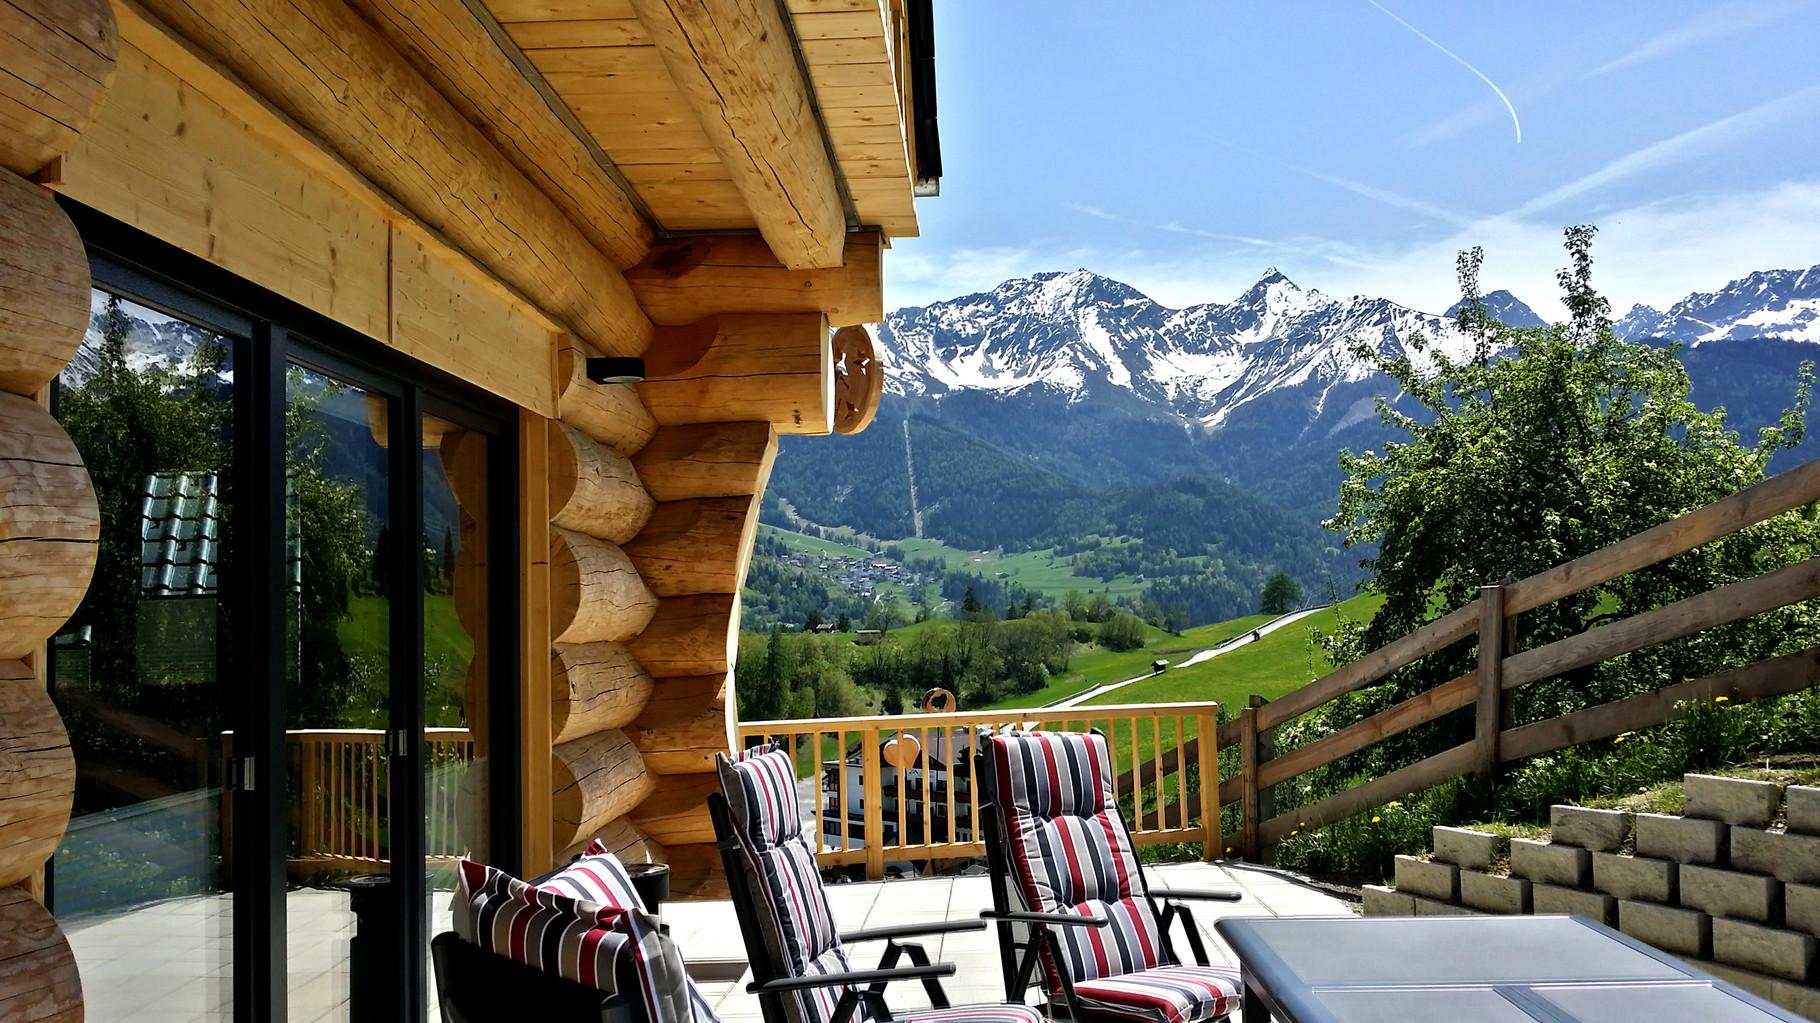 Tirol Chalet TyroLadis das Chalet Lawens